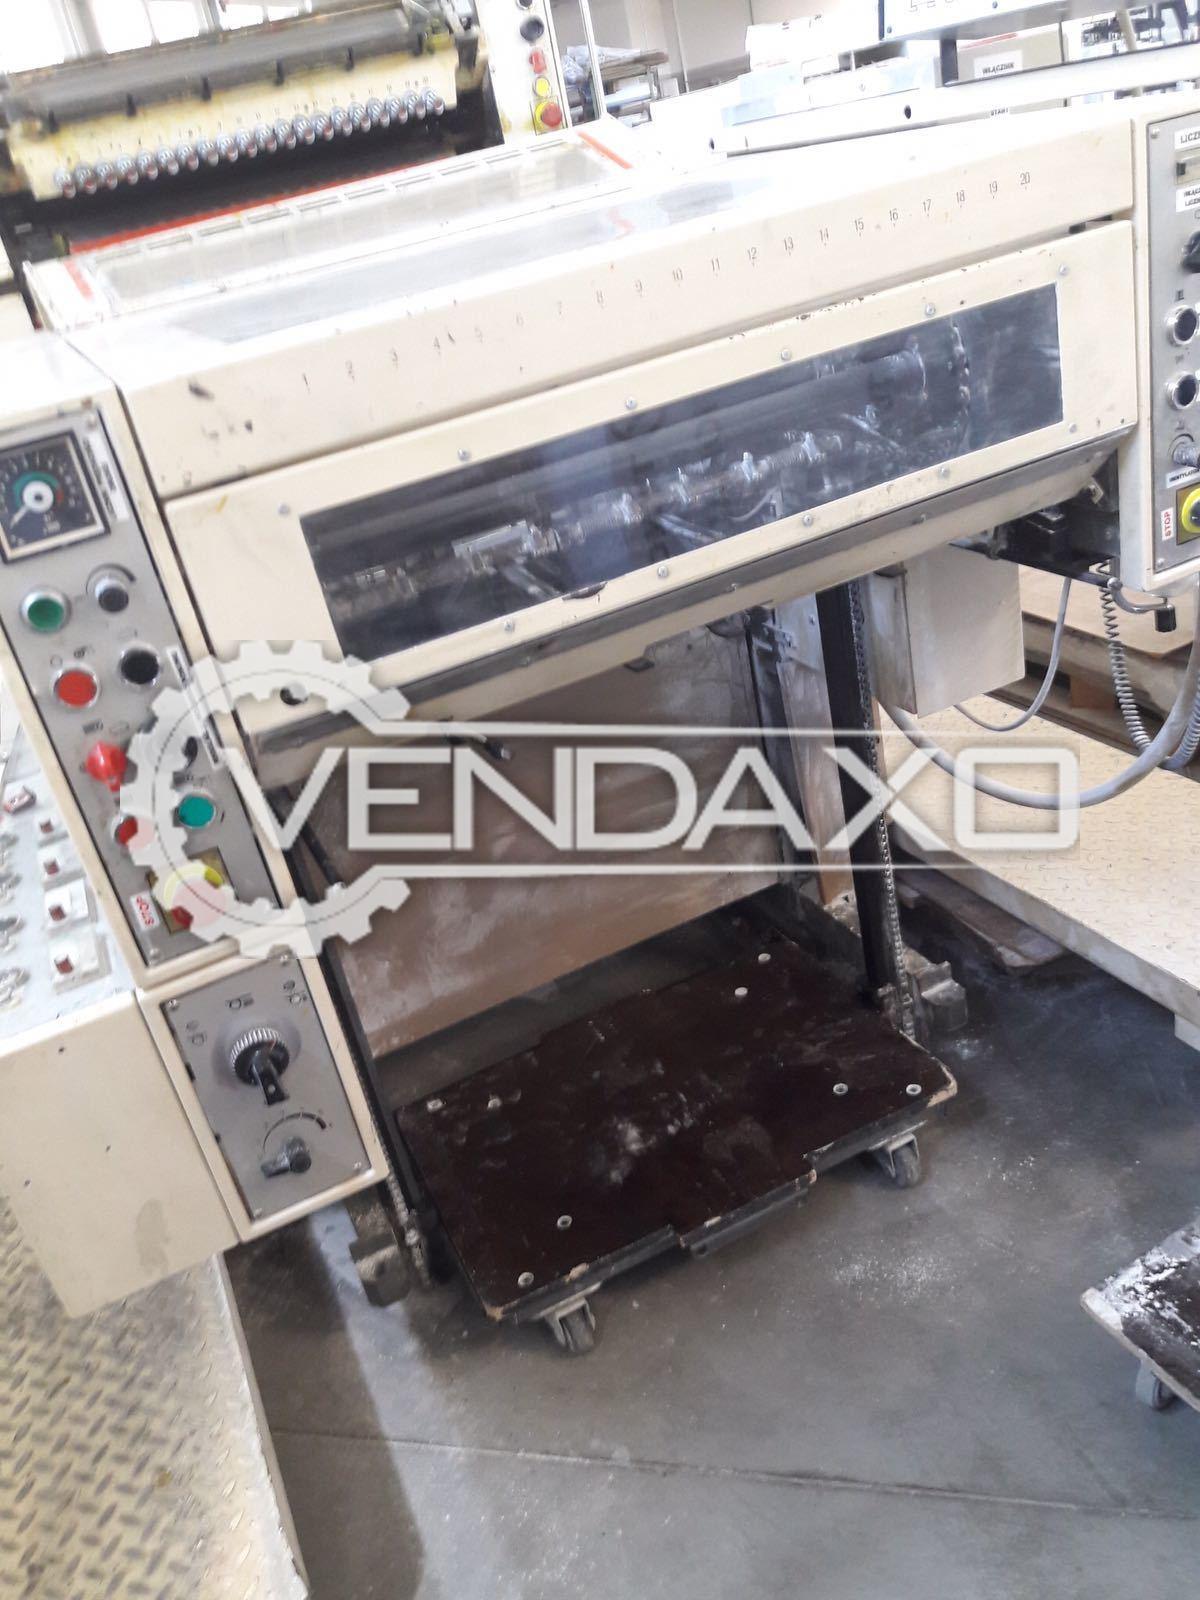 Polly 745 Printing Machine - 19 X 26 Inch